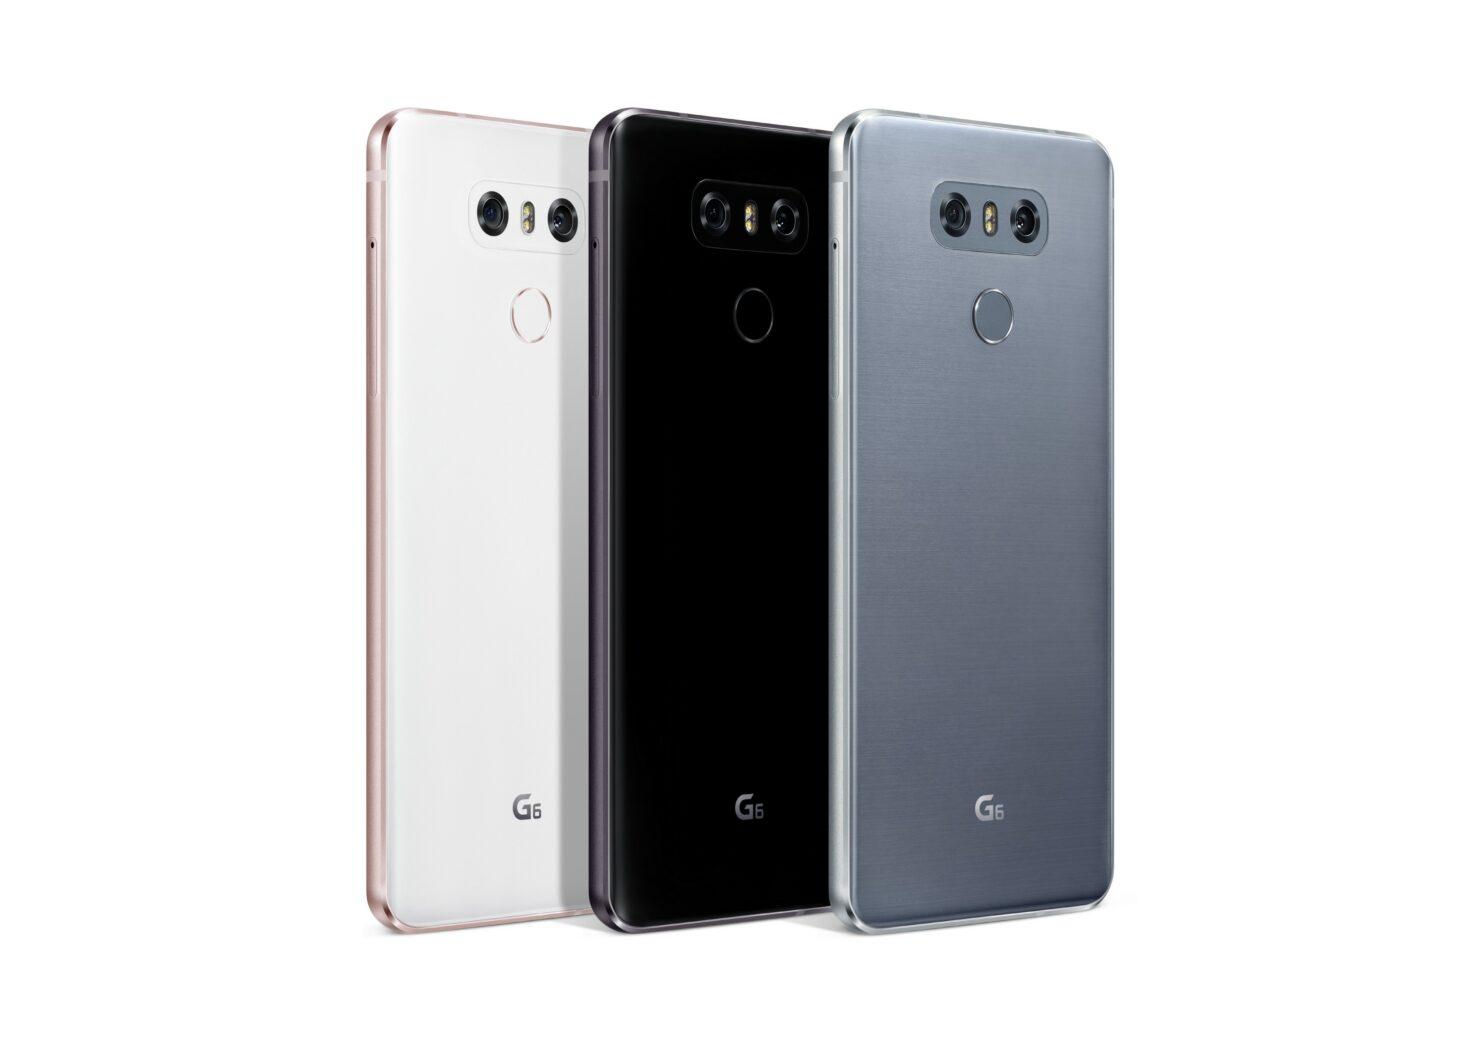 LG G6 microSD card expansion